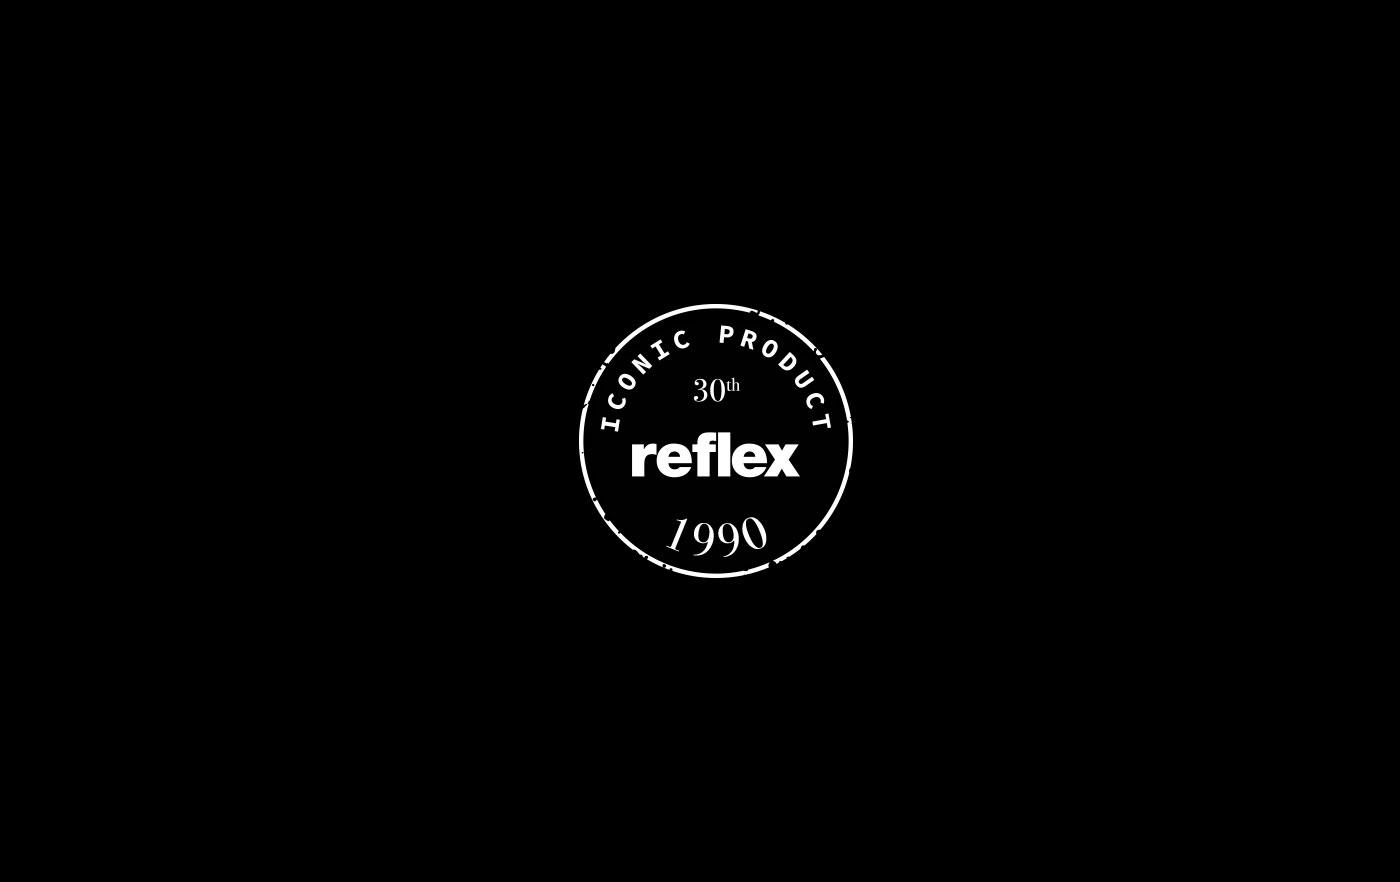 REFLEXANGELO company profile grafico milano 07